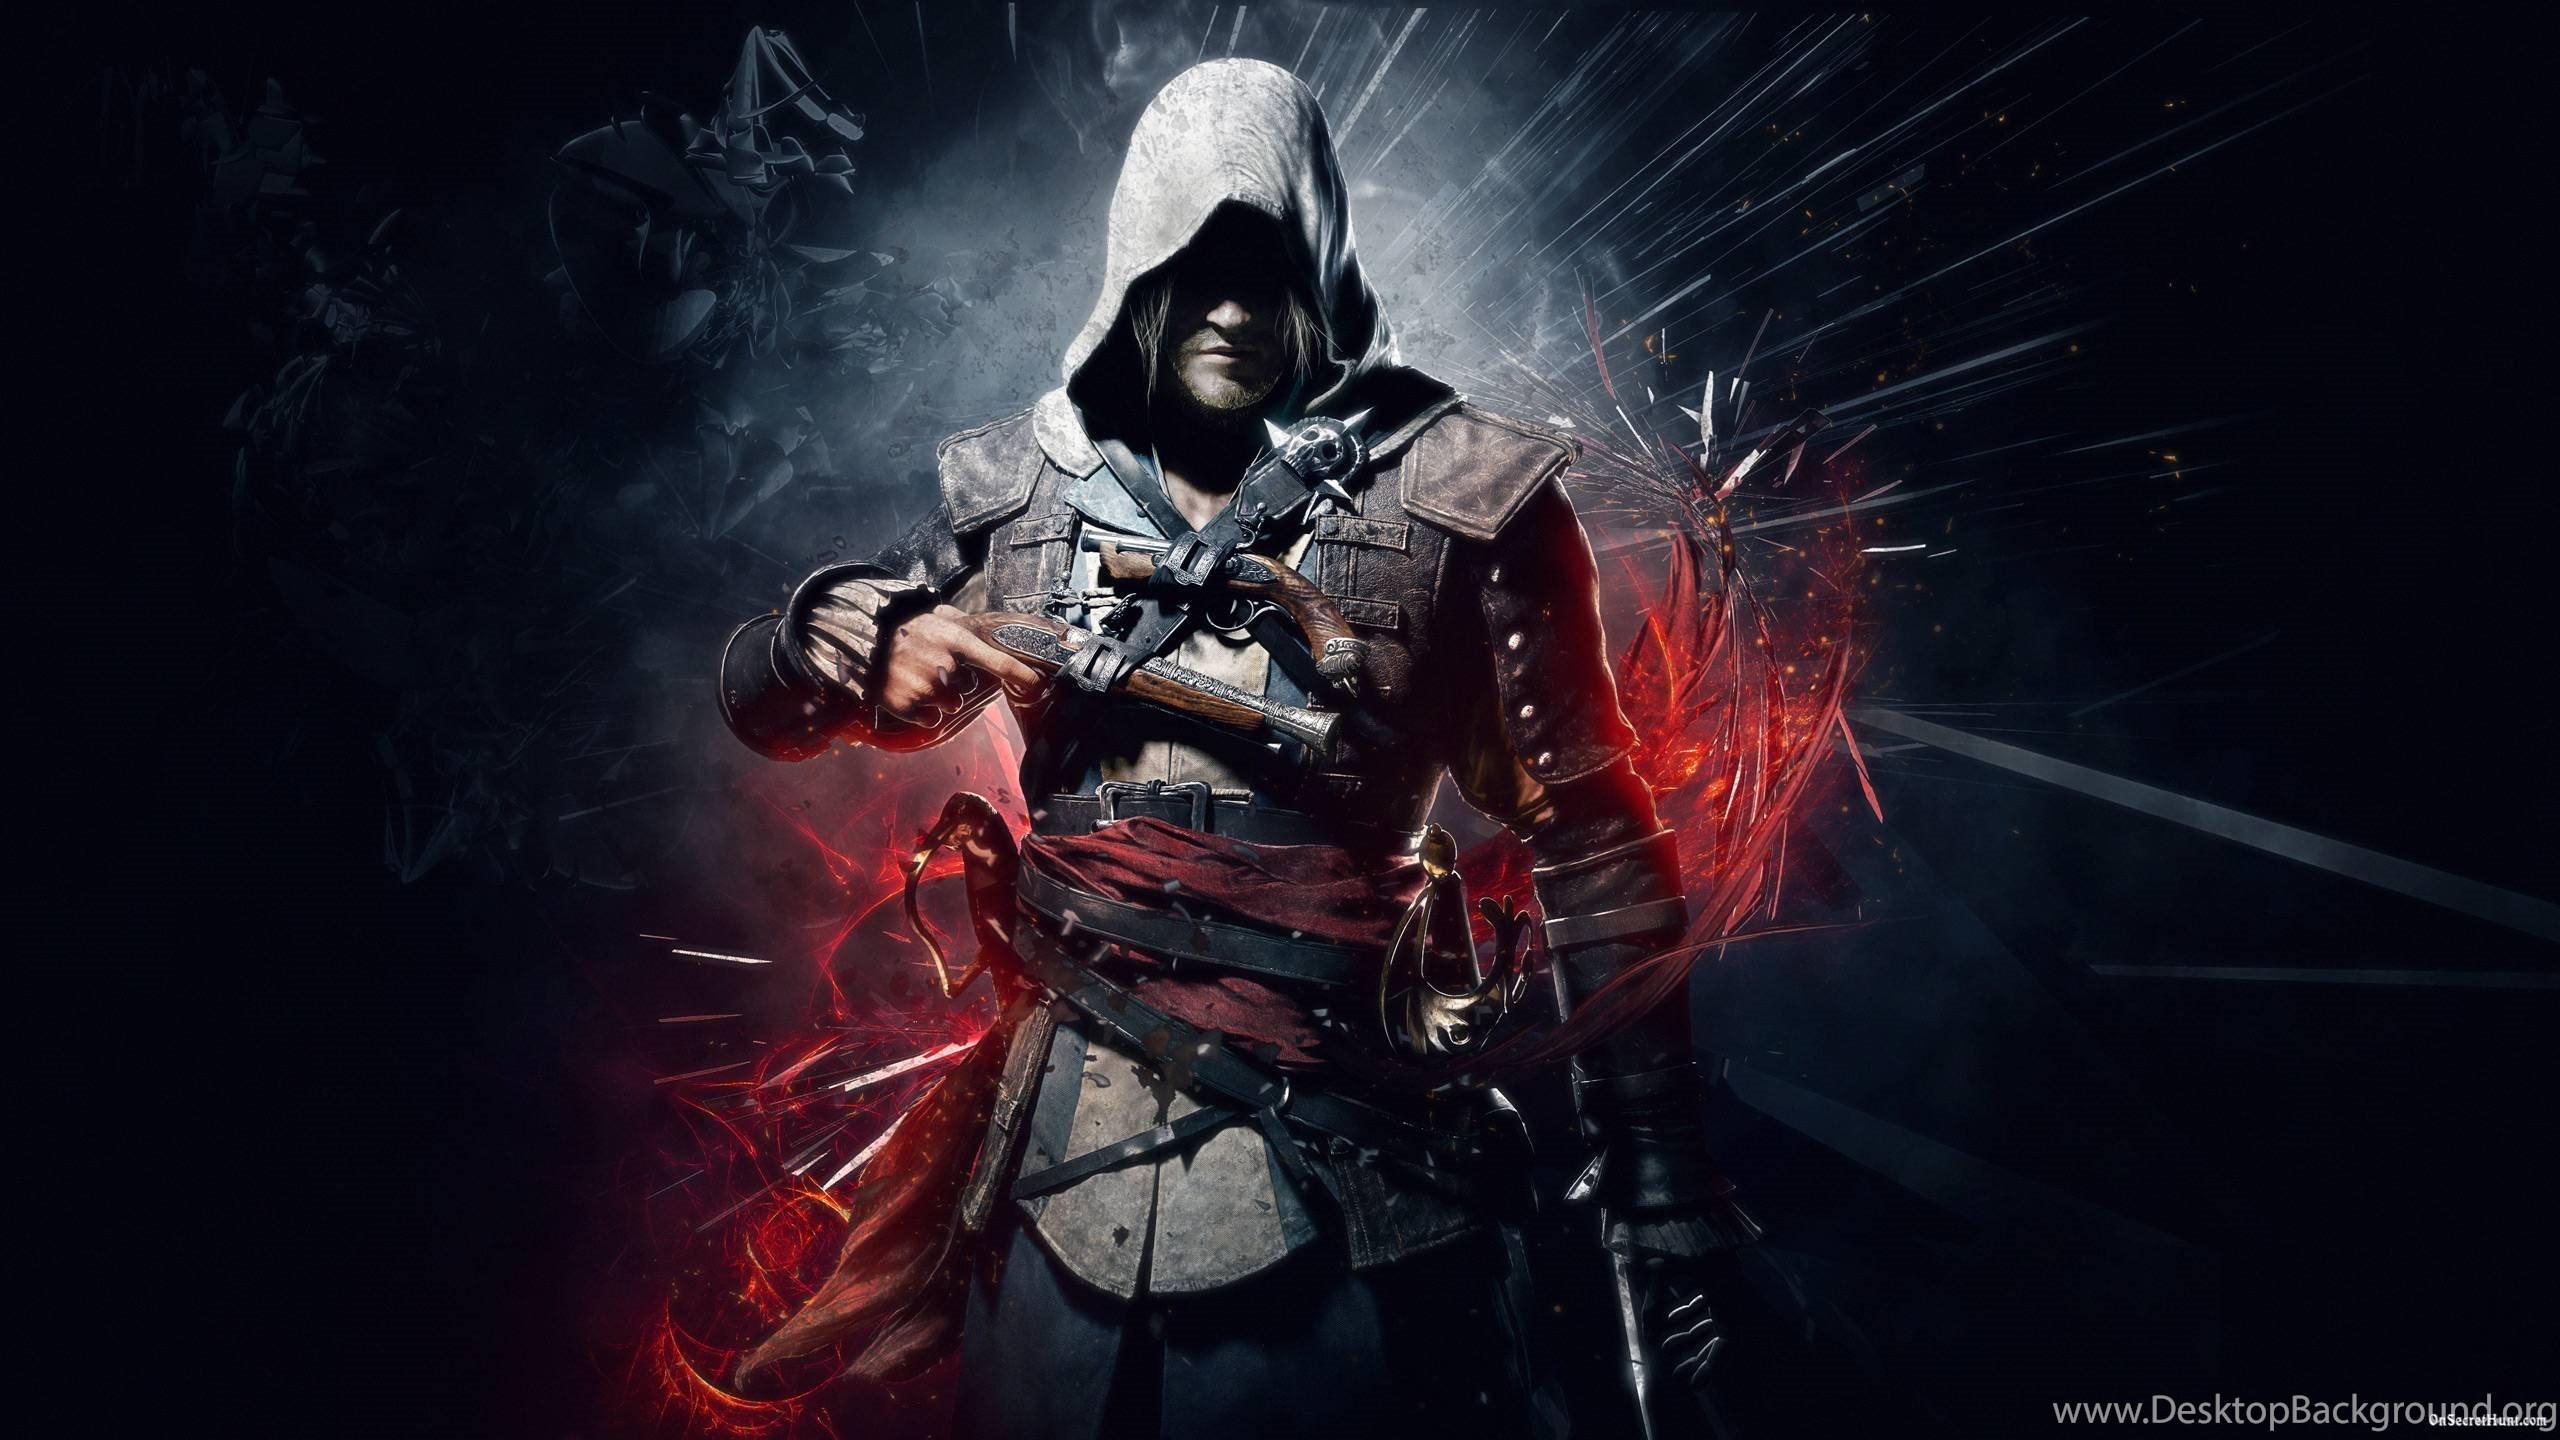 Assassins Creed 4 Black Flag Game Hd Wallpapers Jpg 294435 Desktop